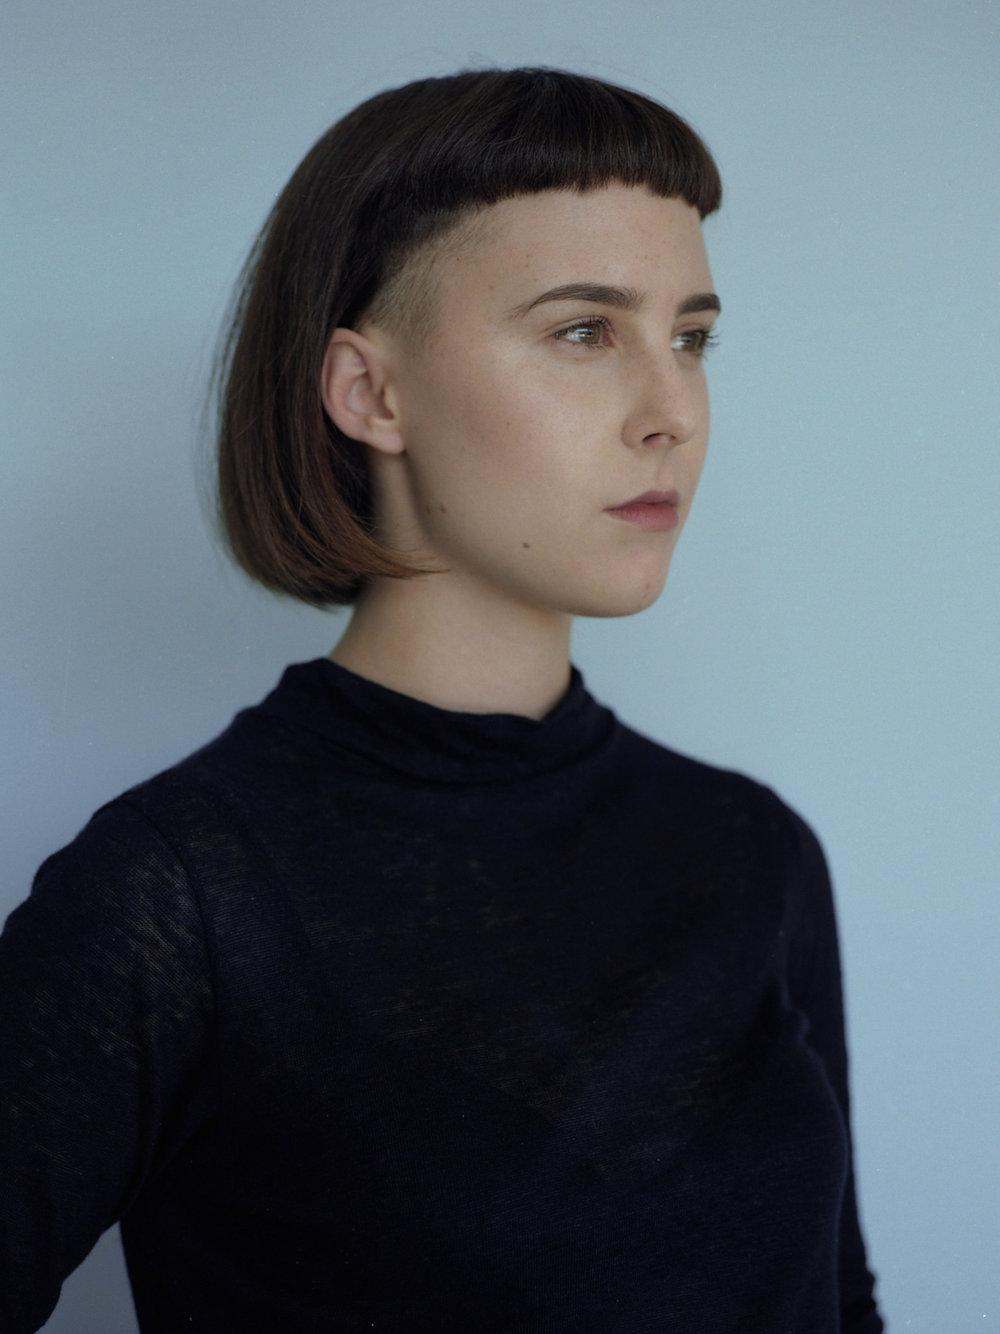 Headshot by Vinna Laudico